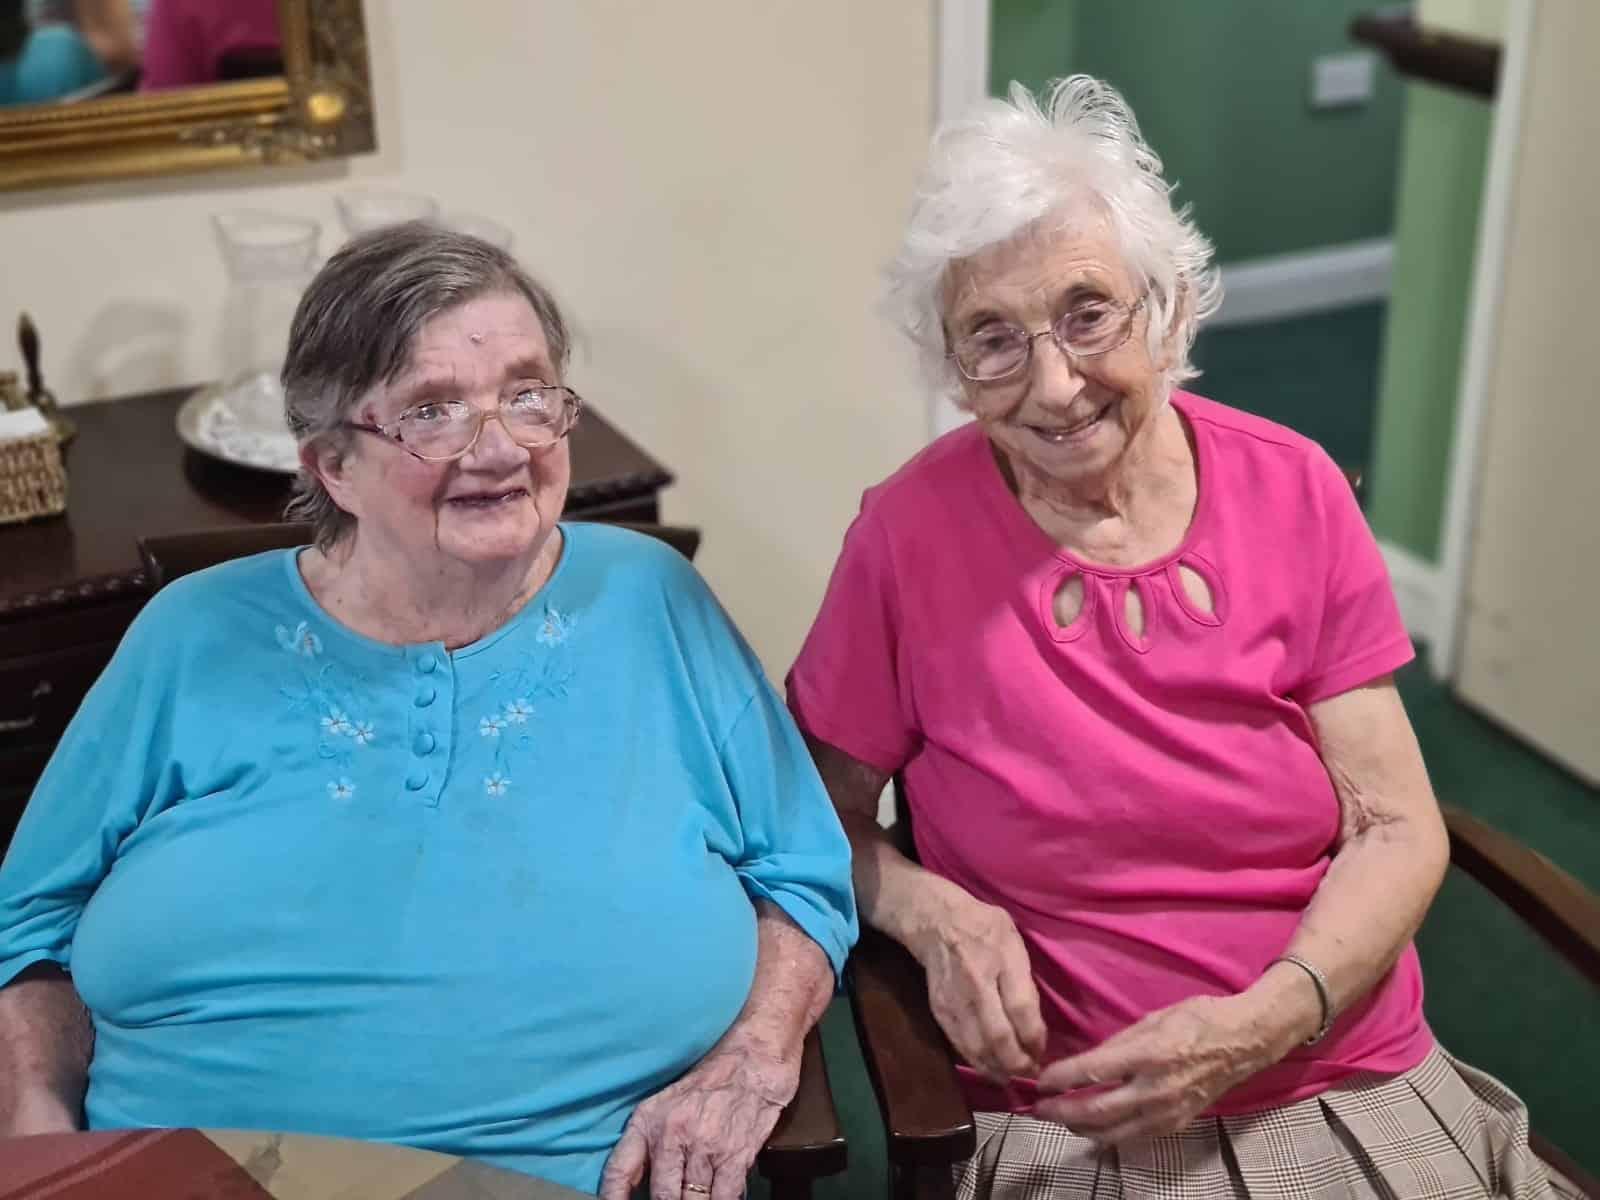 The two Eileens at Cheriton Care Home, Dorchester